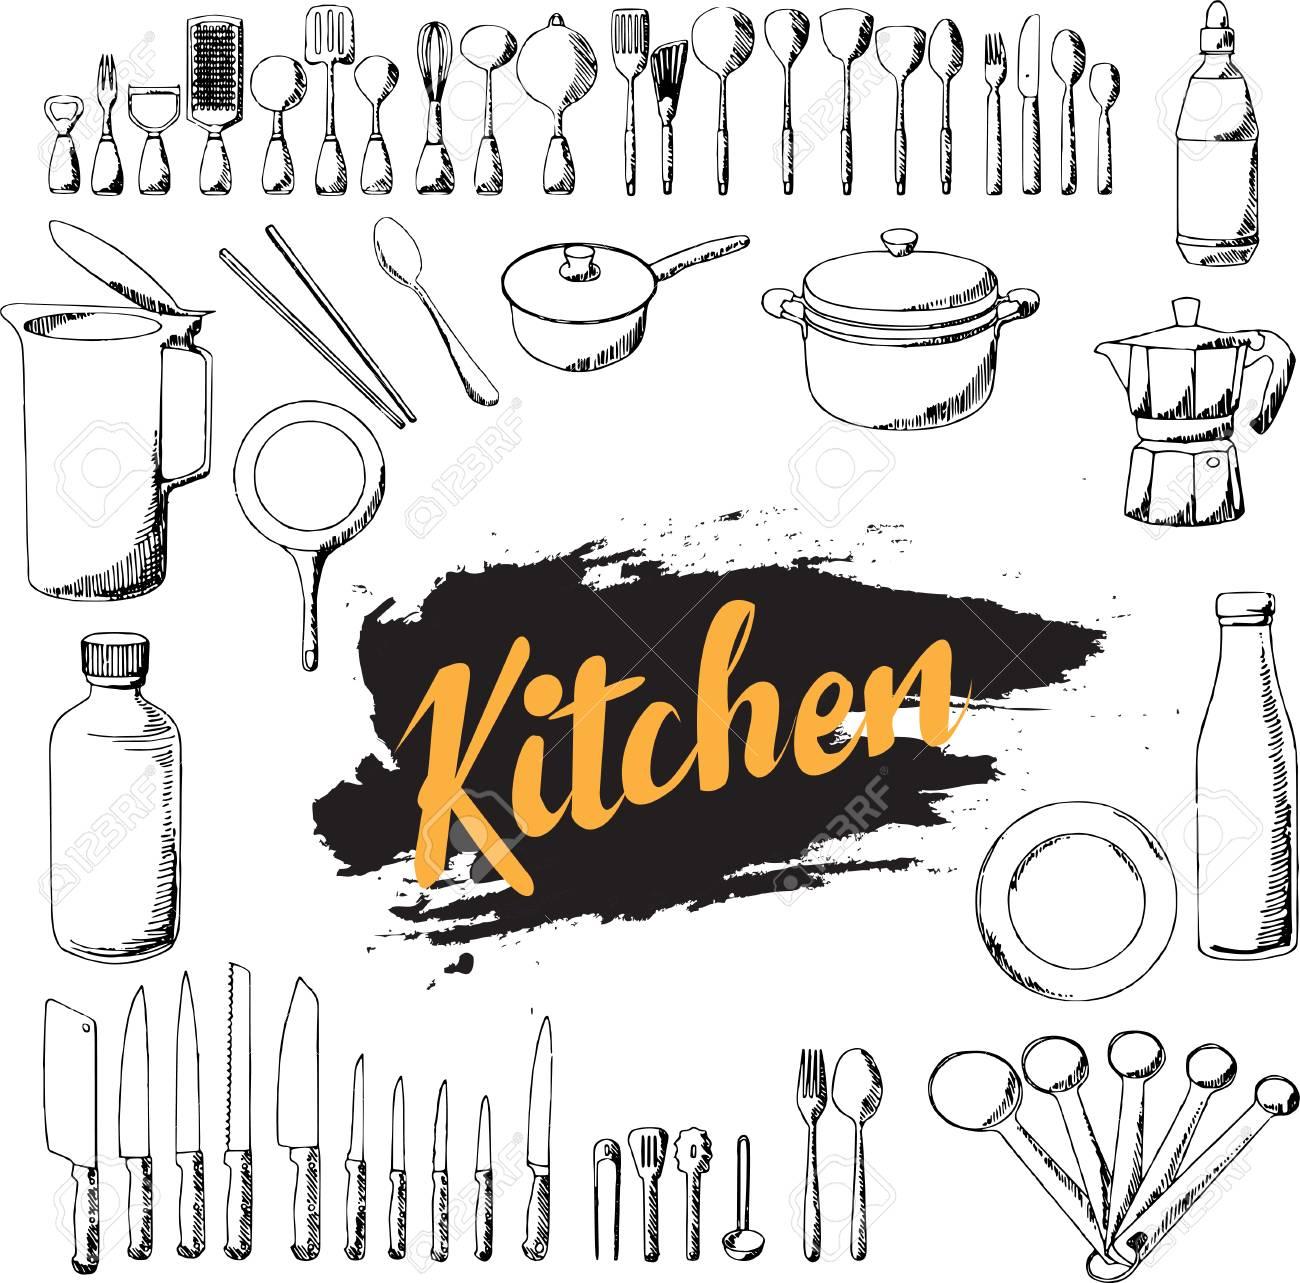 Kitchen Utensils Hand Draw Set Doodle Illustration Eps10 Royalty